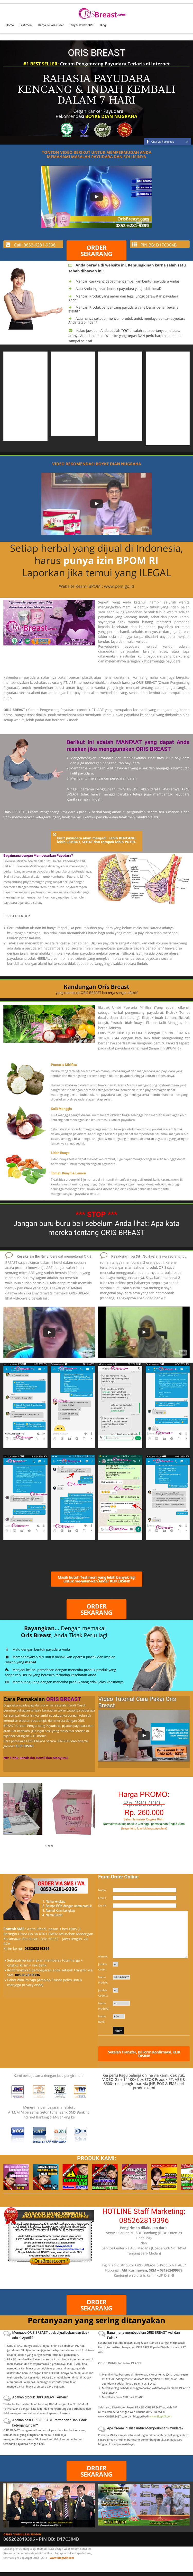 Oris Breast Cream Competitors Revenue And Employees Owler Company Pengencang Payudara Ampamp Cegah Kanker Website History